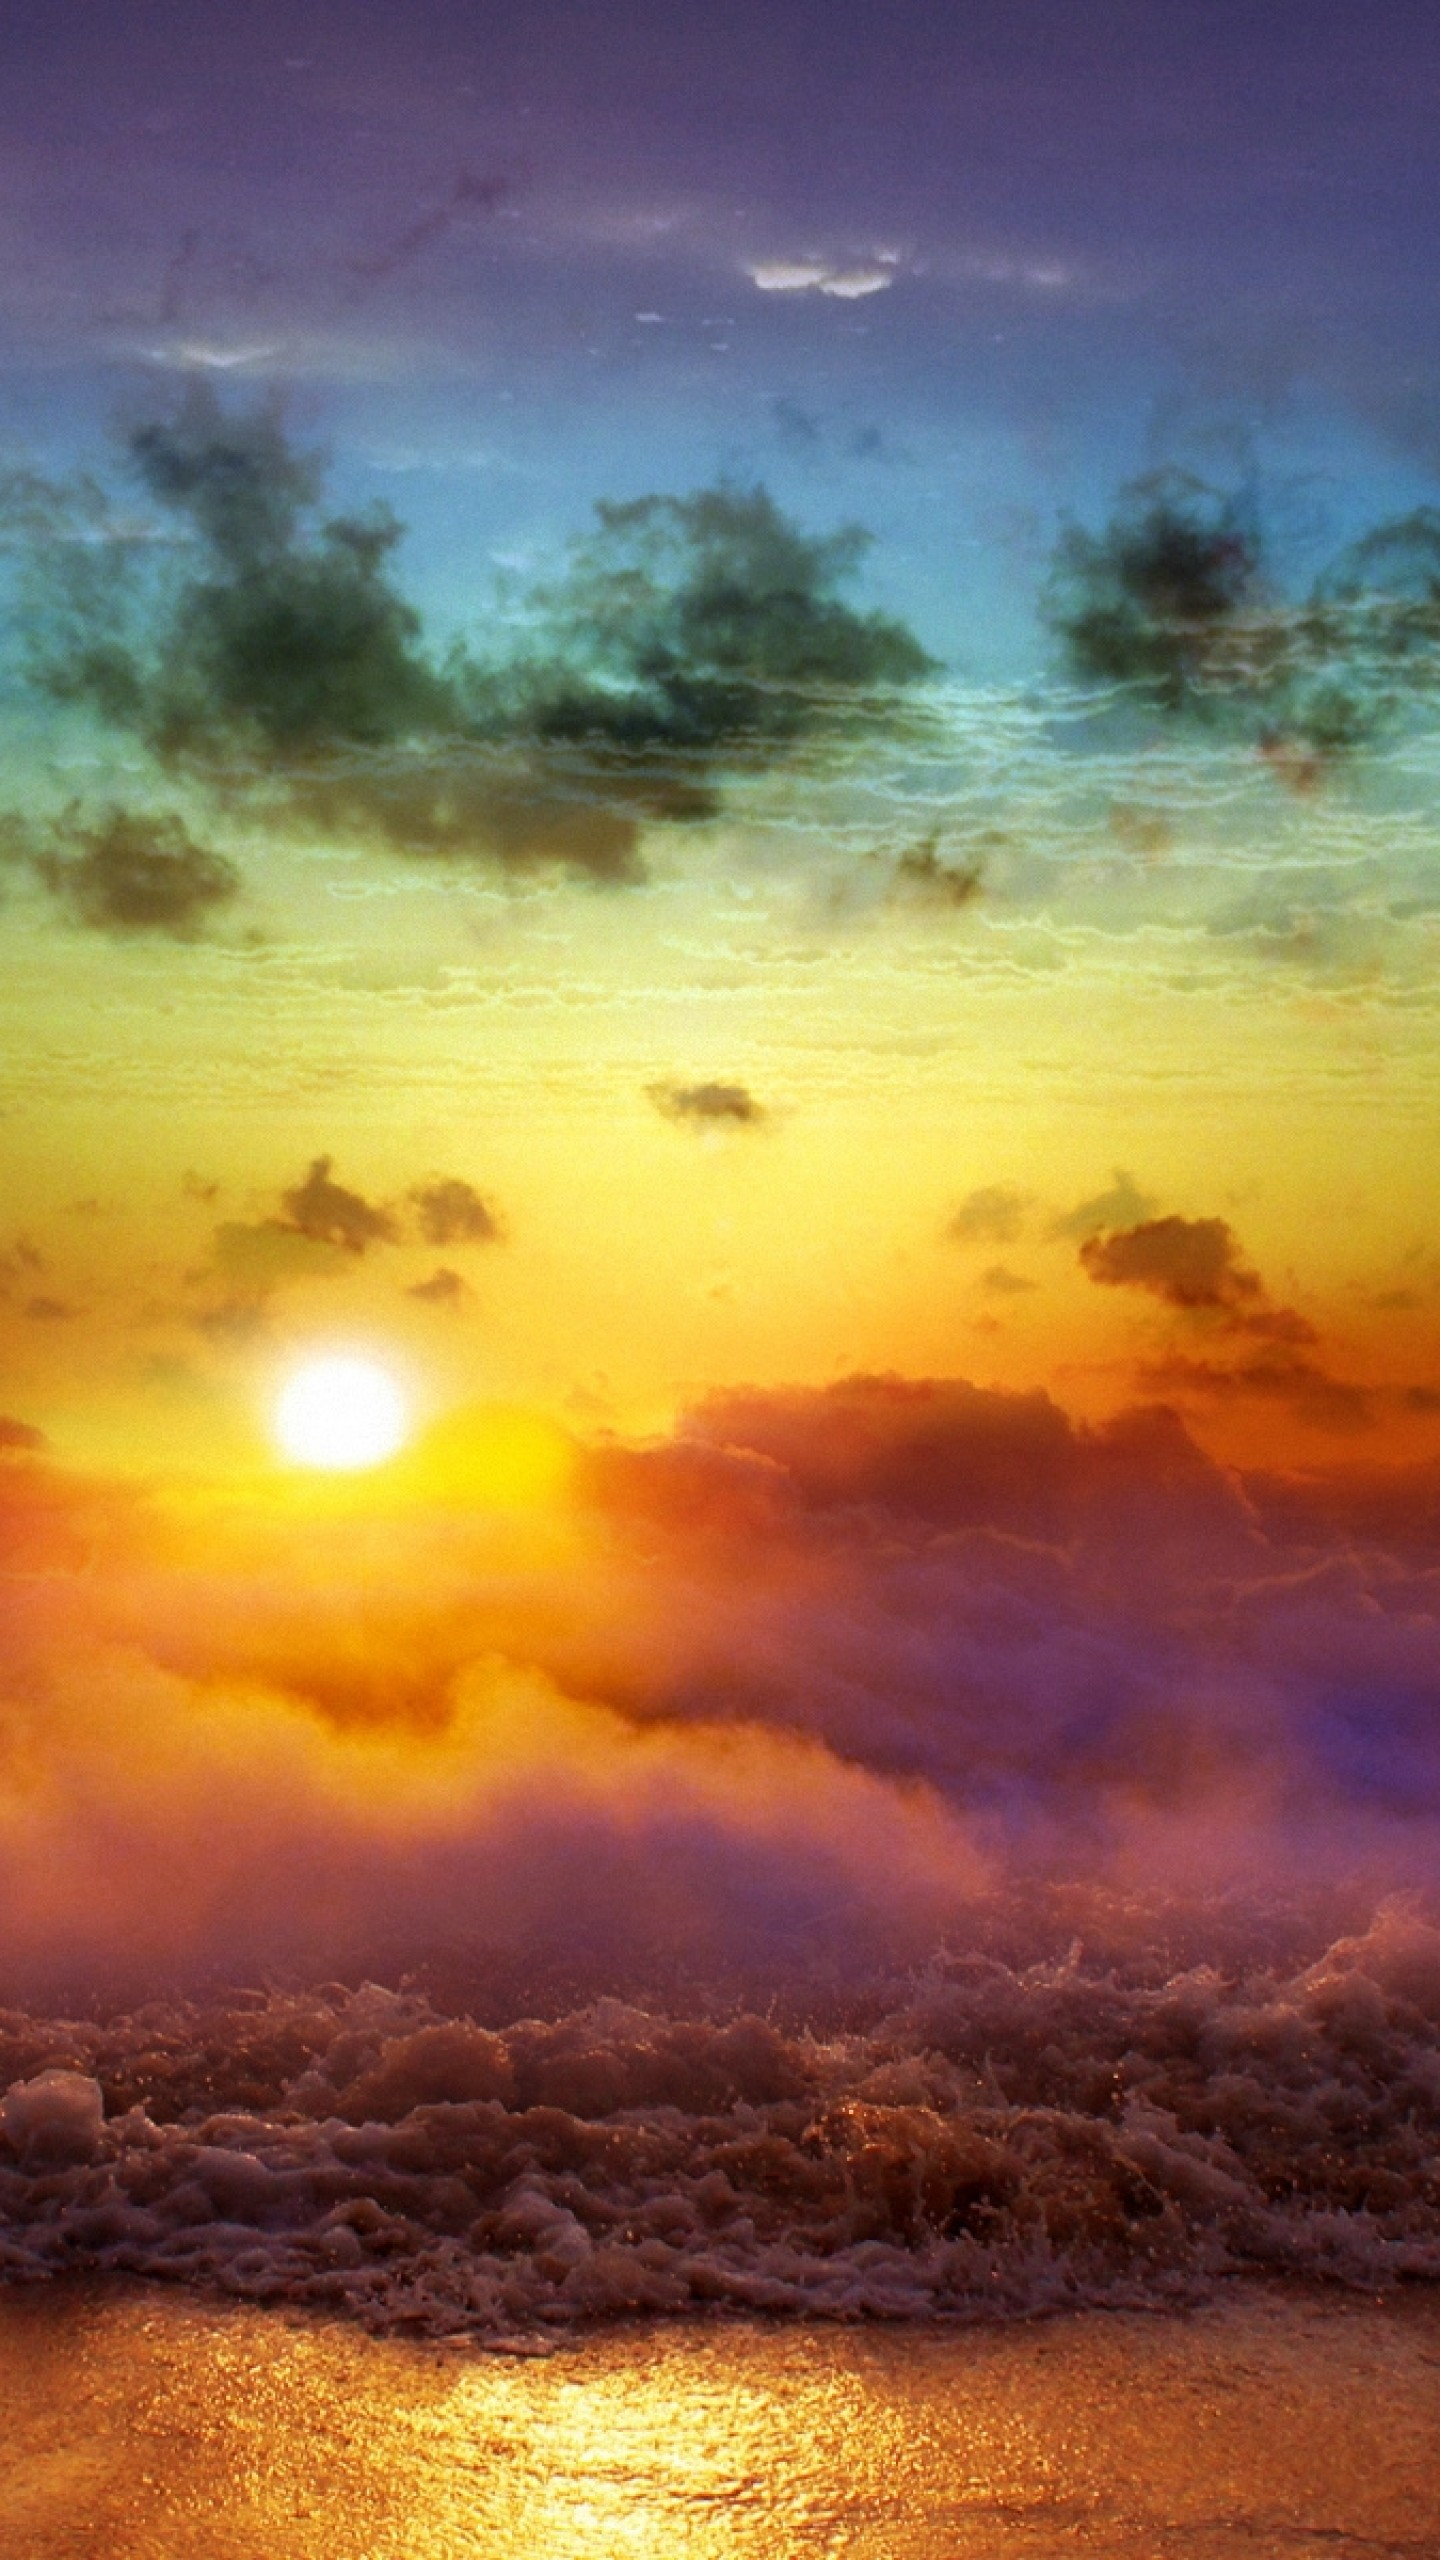 Preview wallpaper moon, sun, decline, evening, merge, day, night,